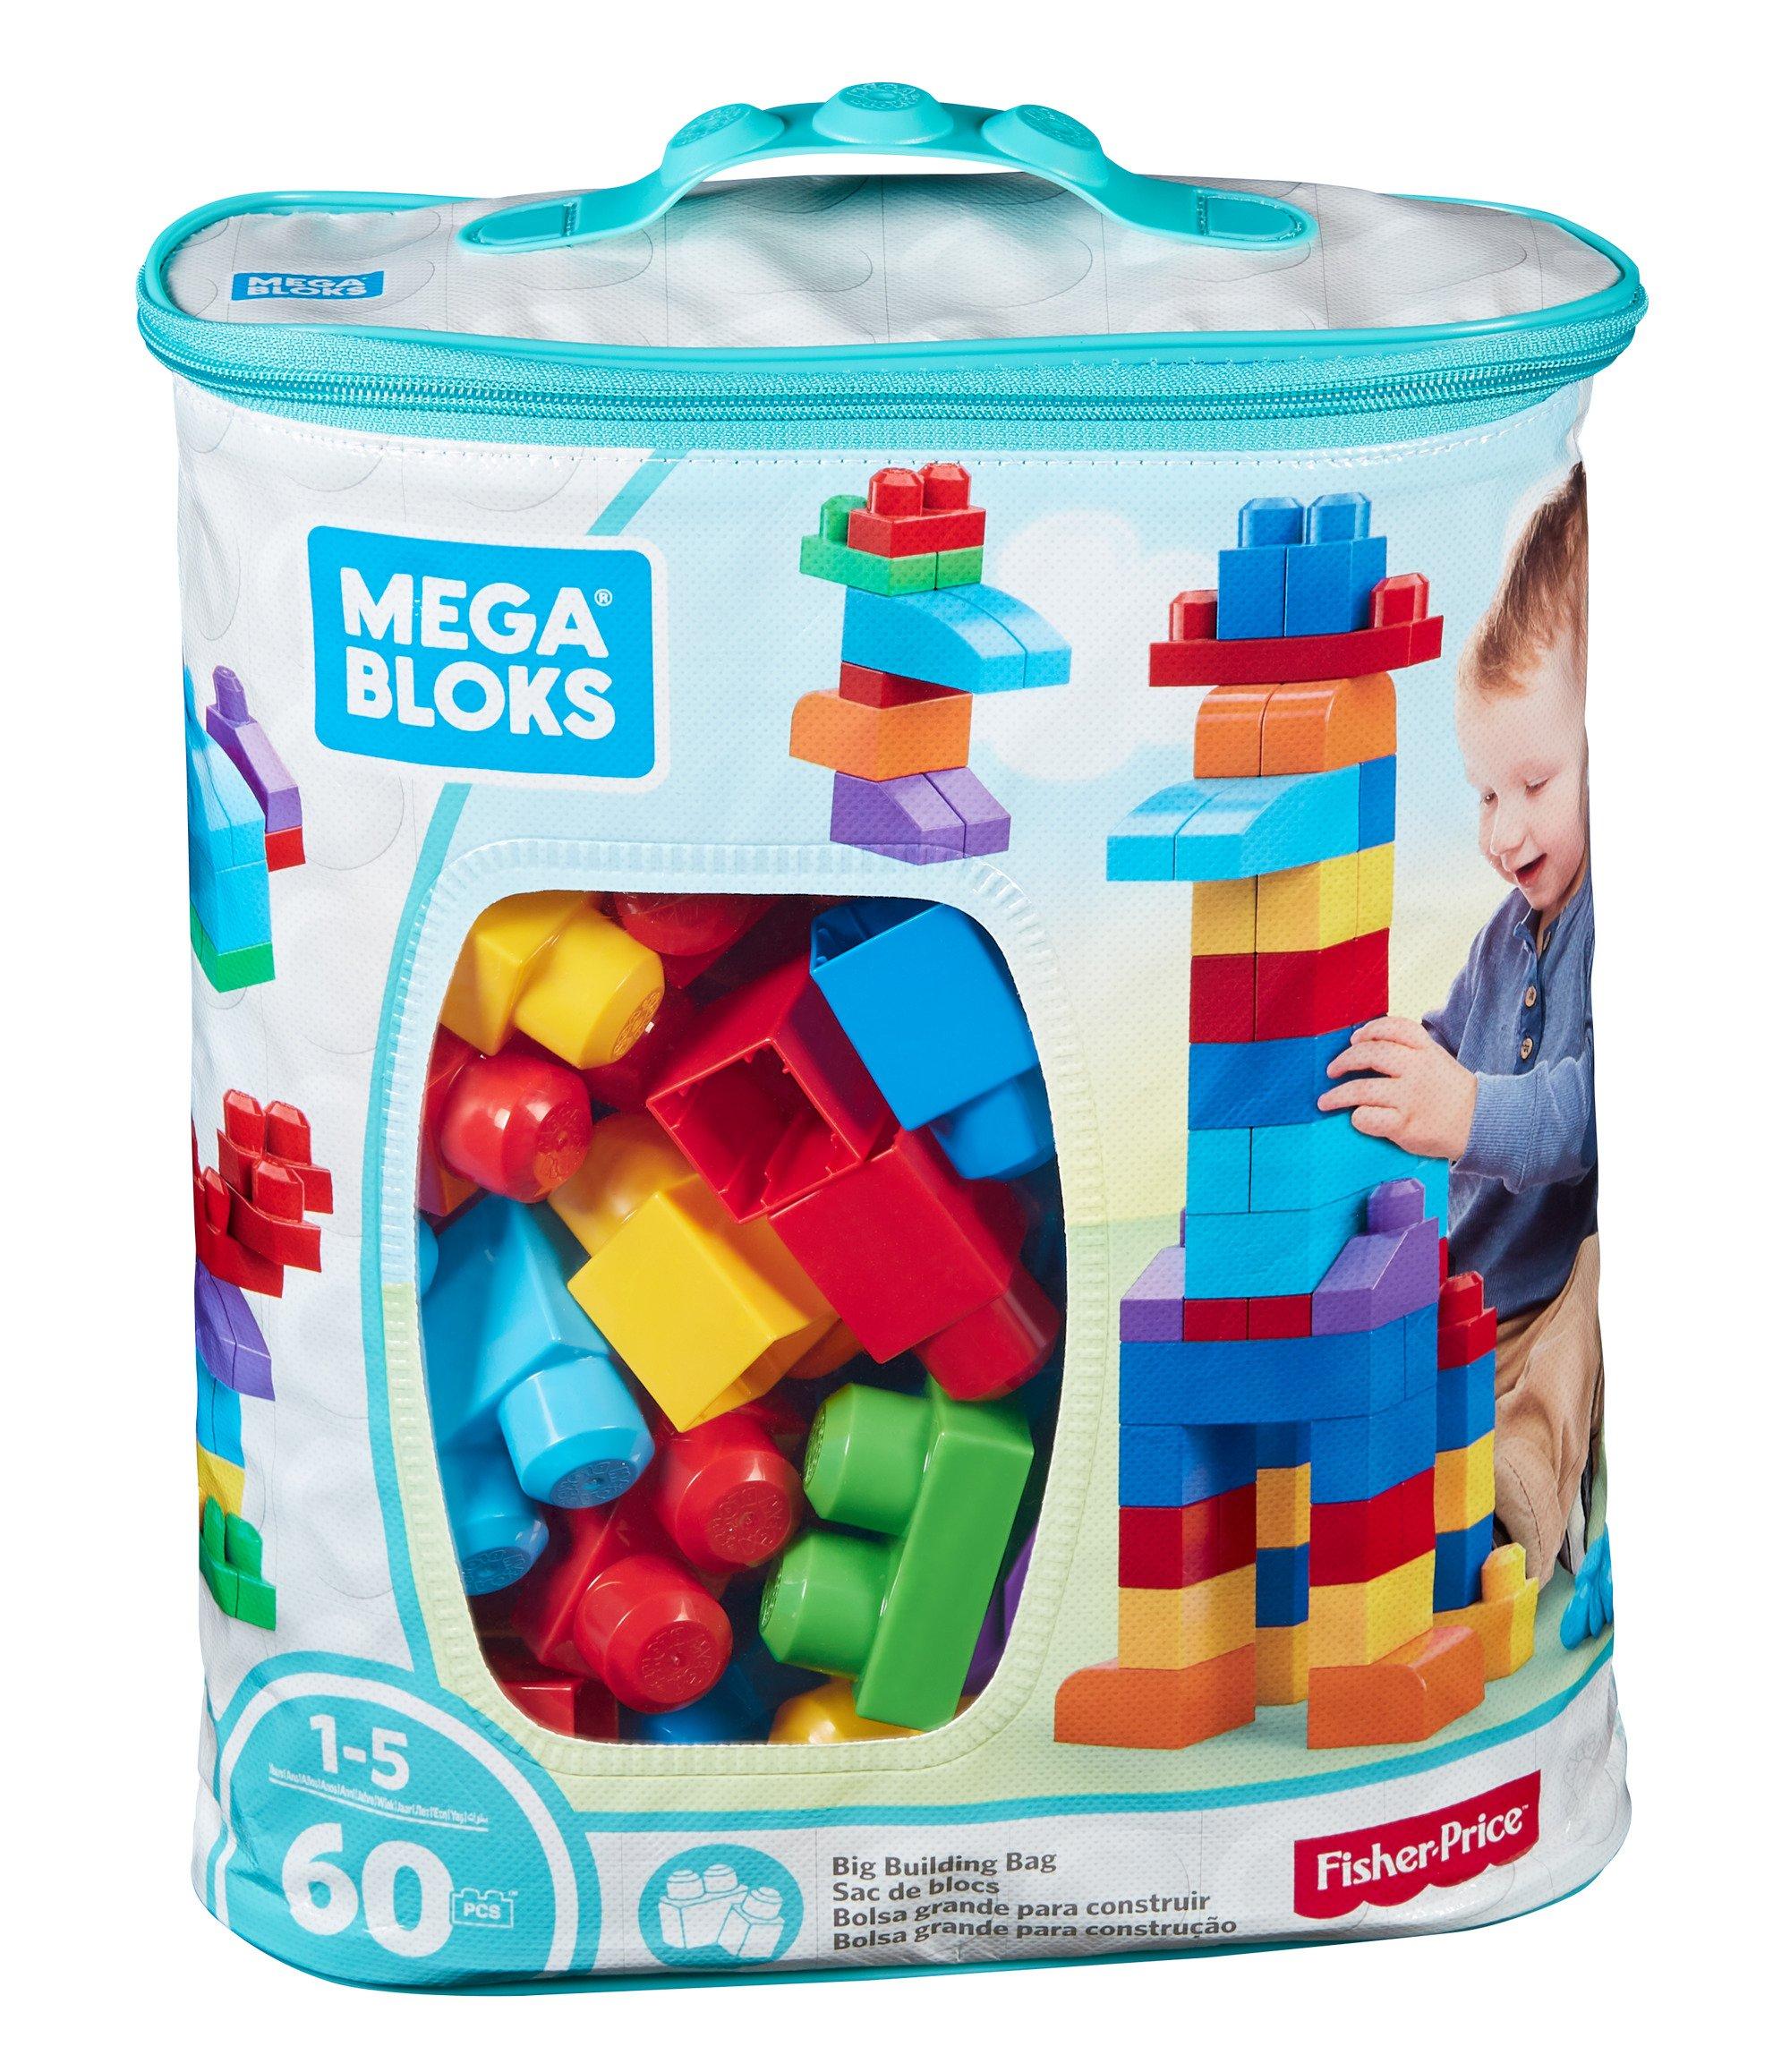 Mega Bloks DCH55 Sacca Ecologica Blu 60 Pezzi product image